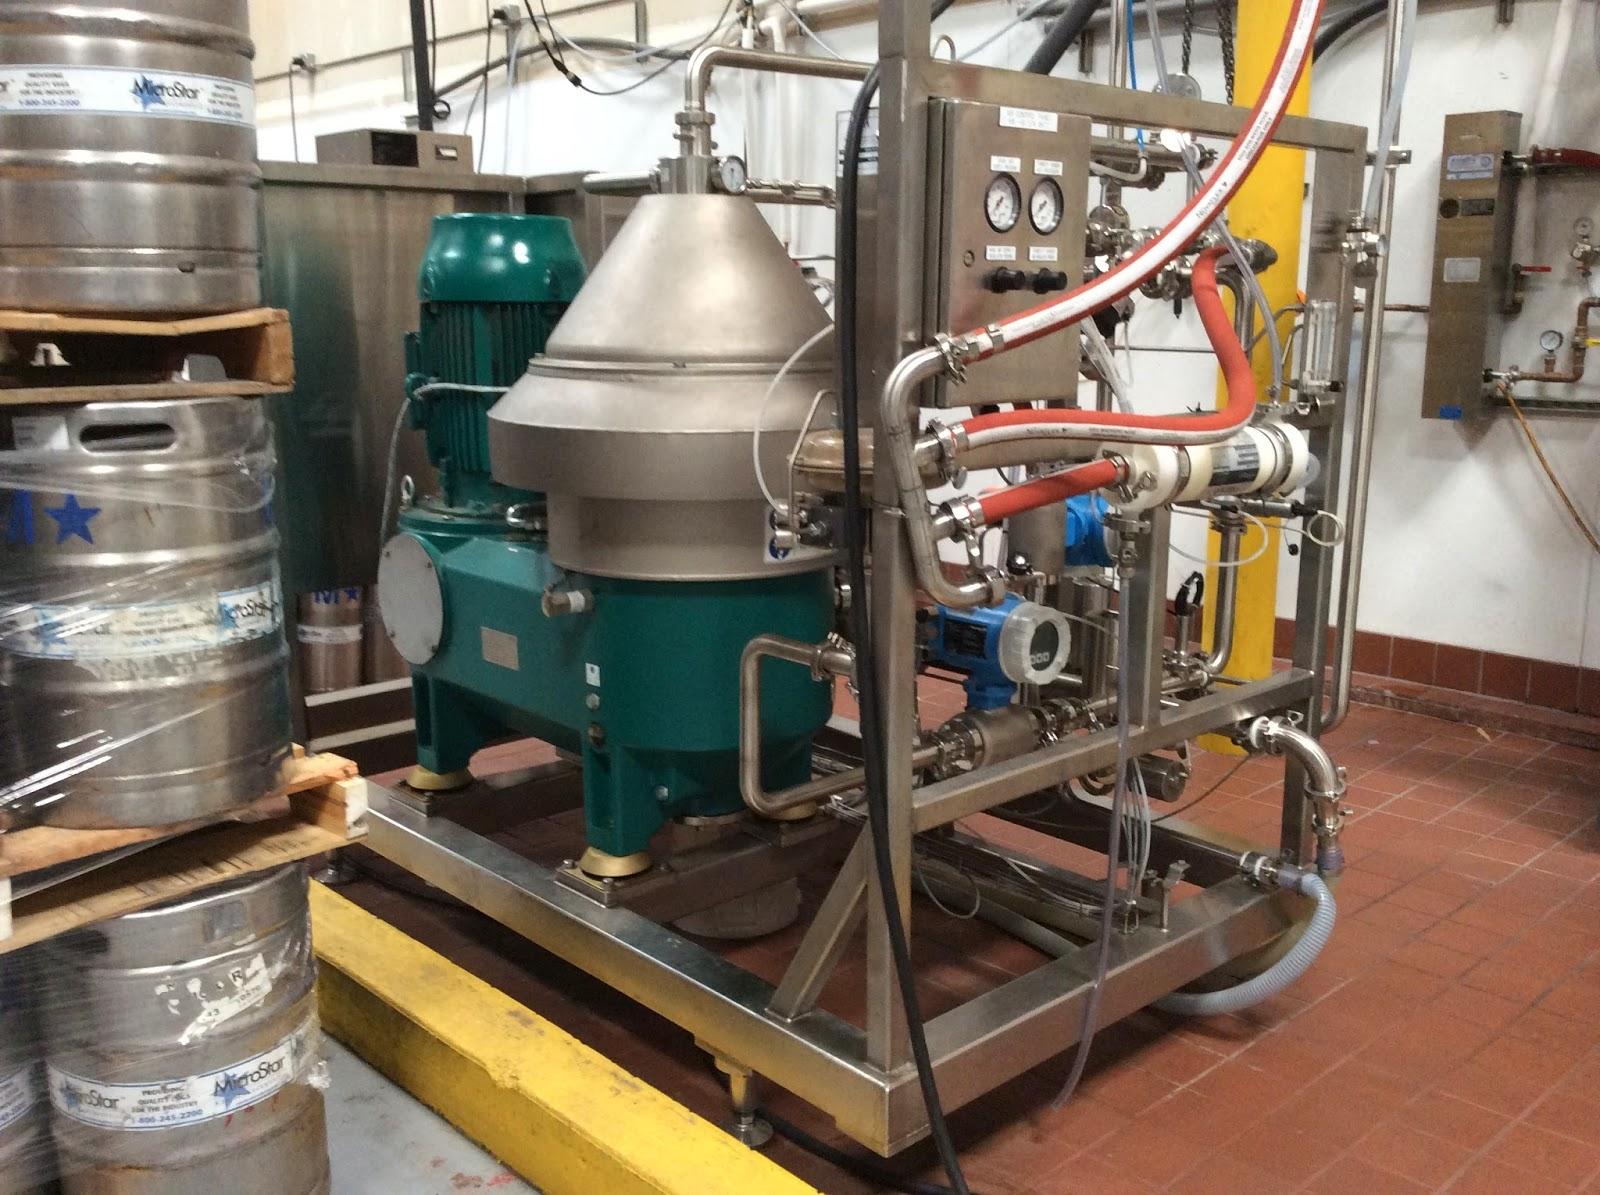 Storing Carbonated Kegs At Room Temperature